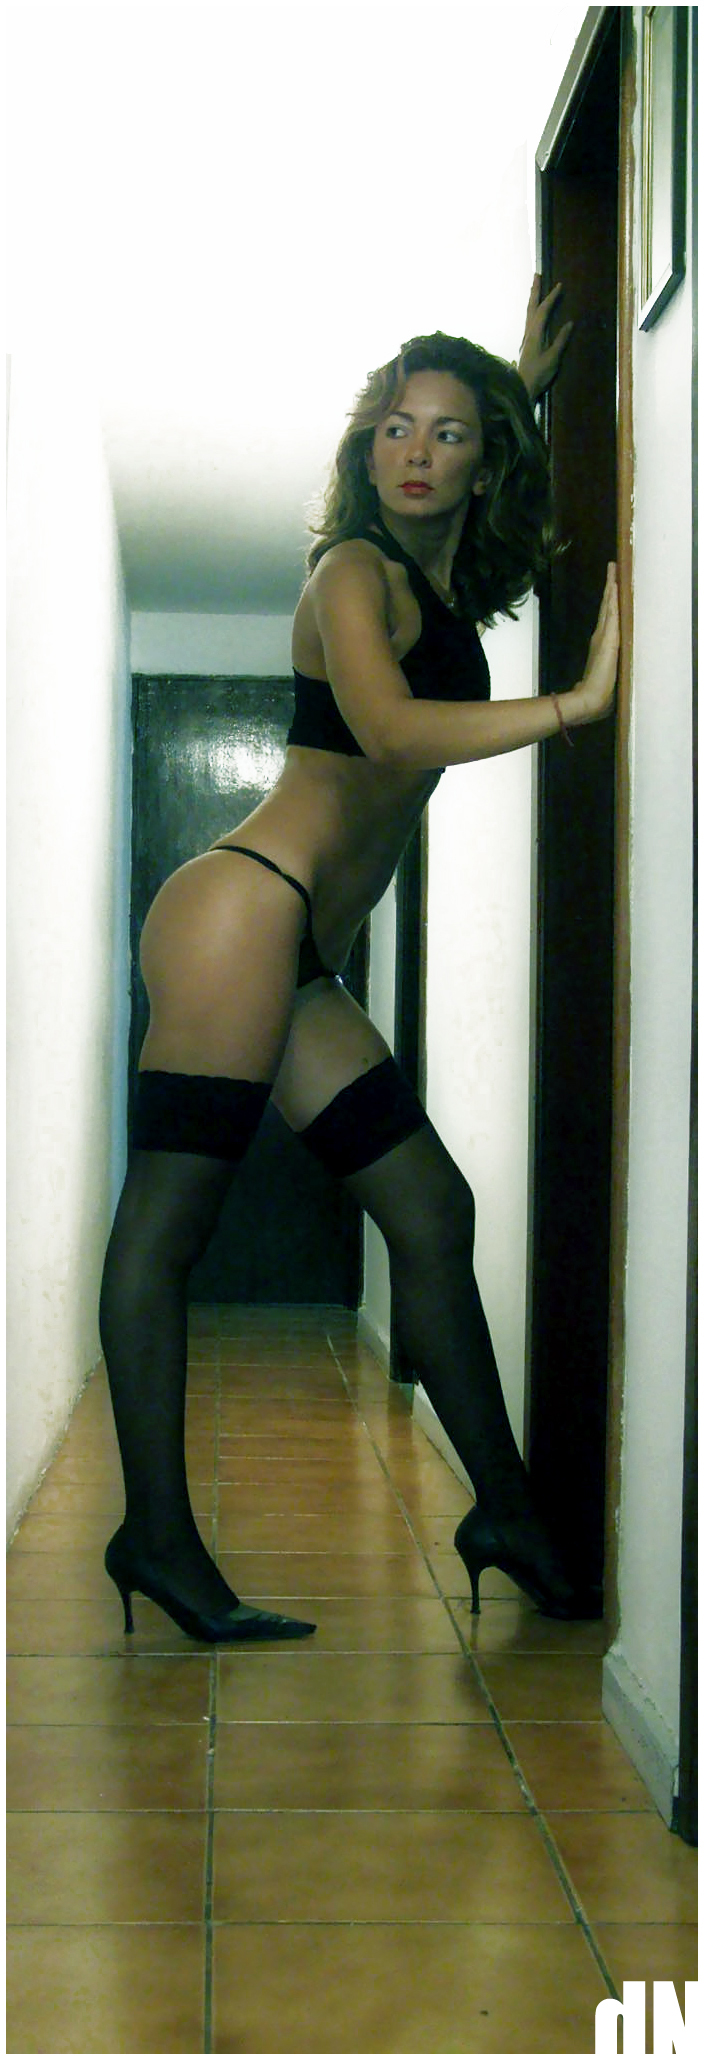 Jan 02, 2008 Daniela Melo